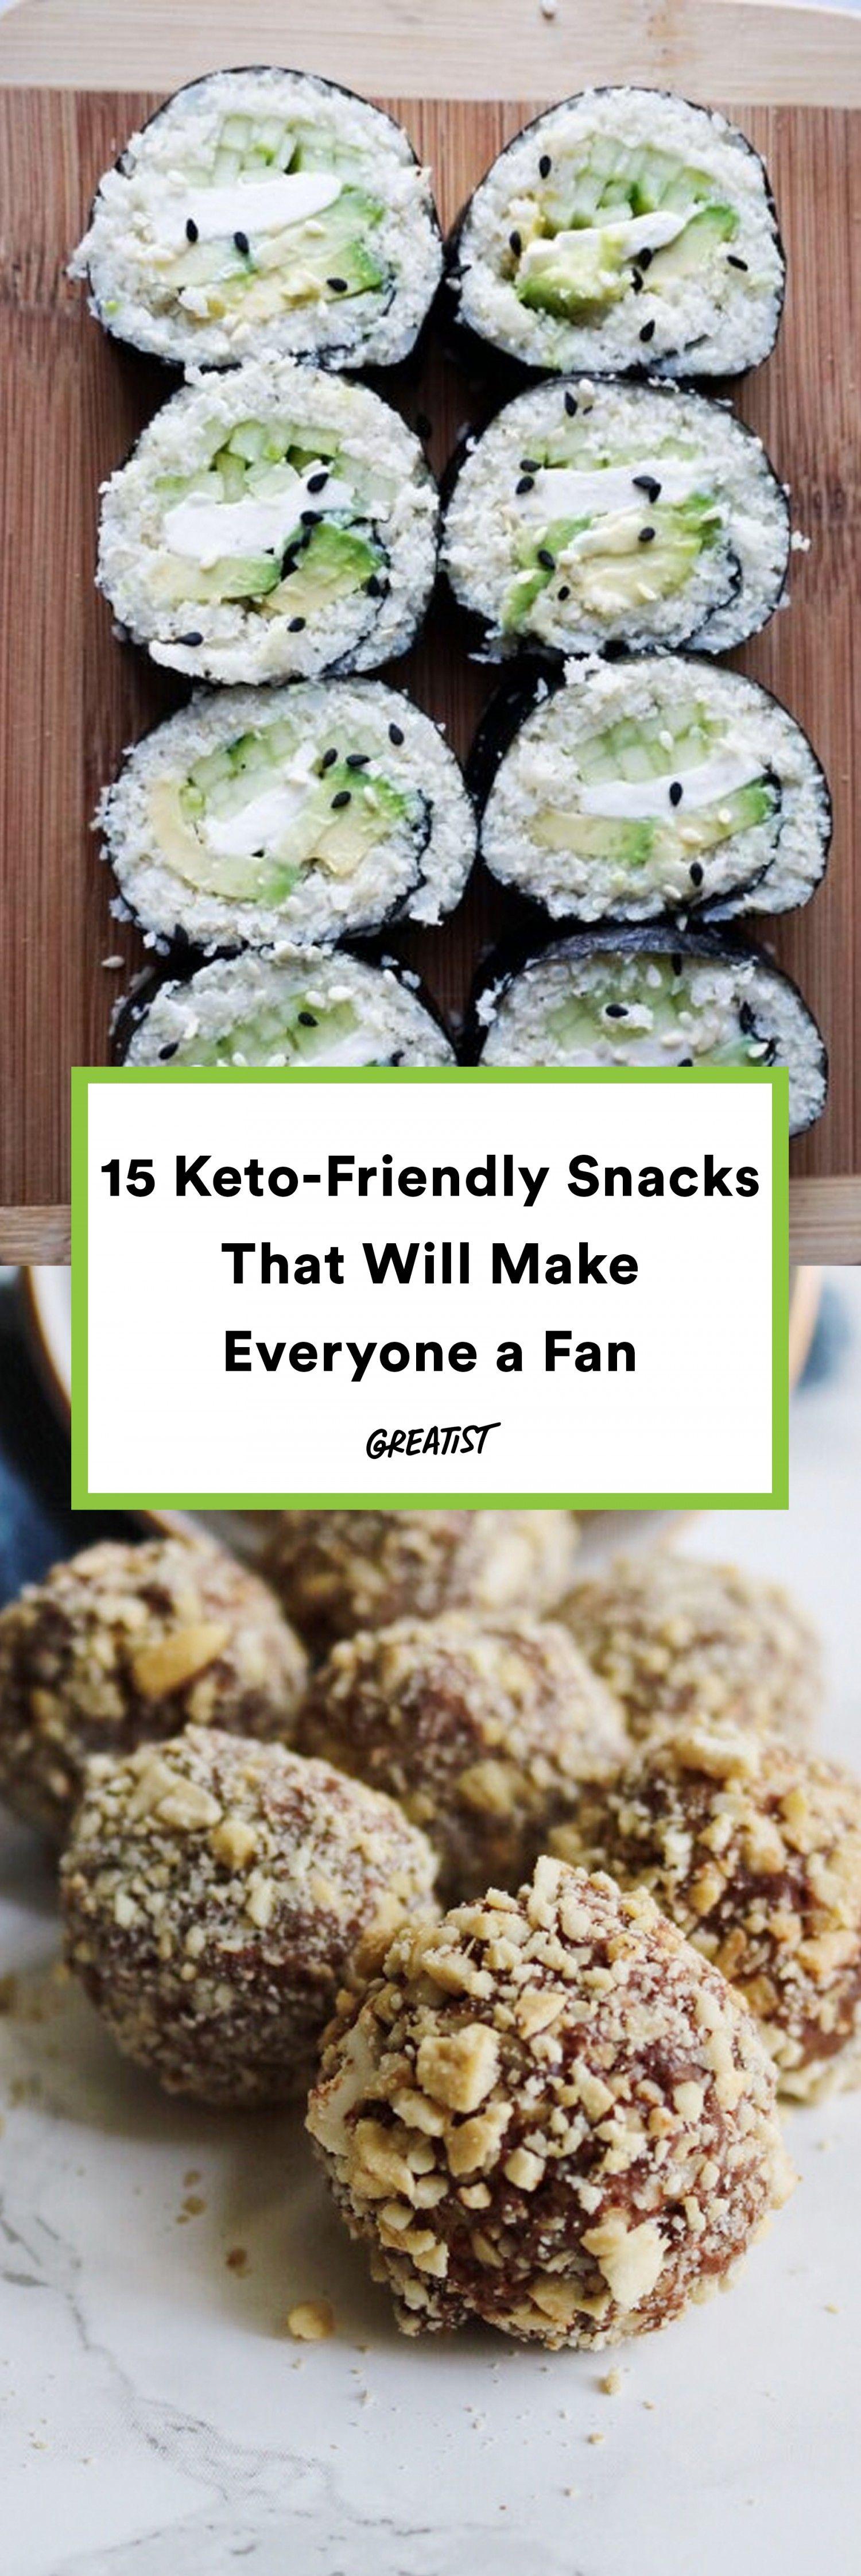 keto comfort foods recipes